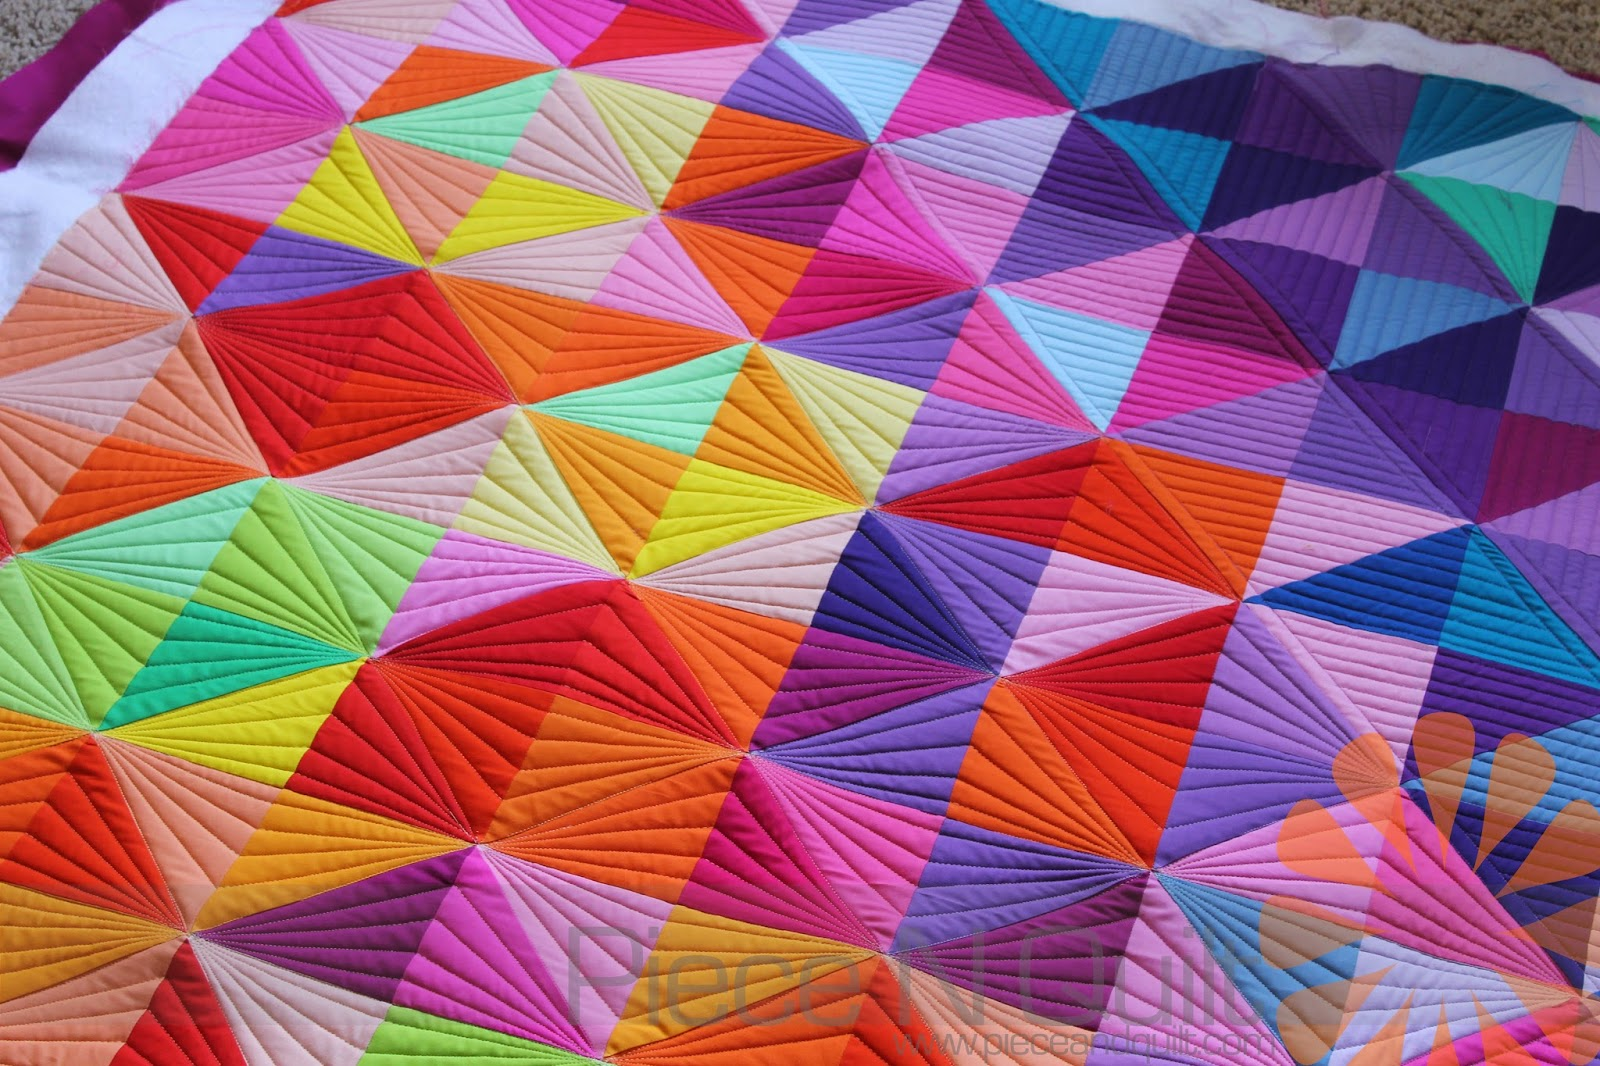 Piece N Quilt: Half Square Triangle Quilt - Custom Machine ... : how to quilt triangles - Adamdwight.com